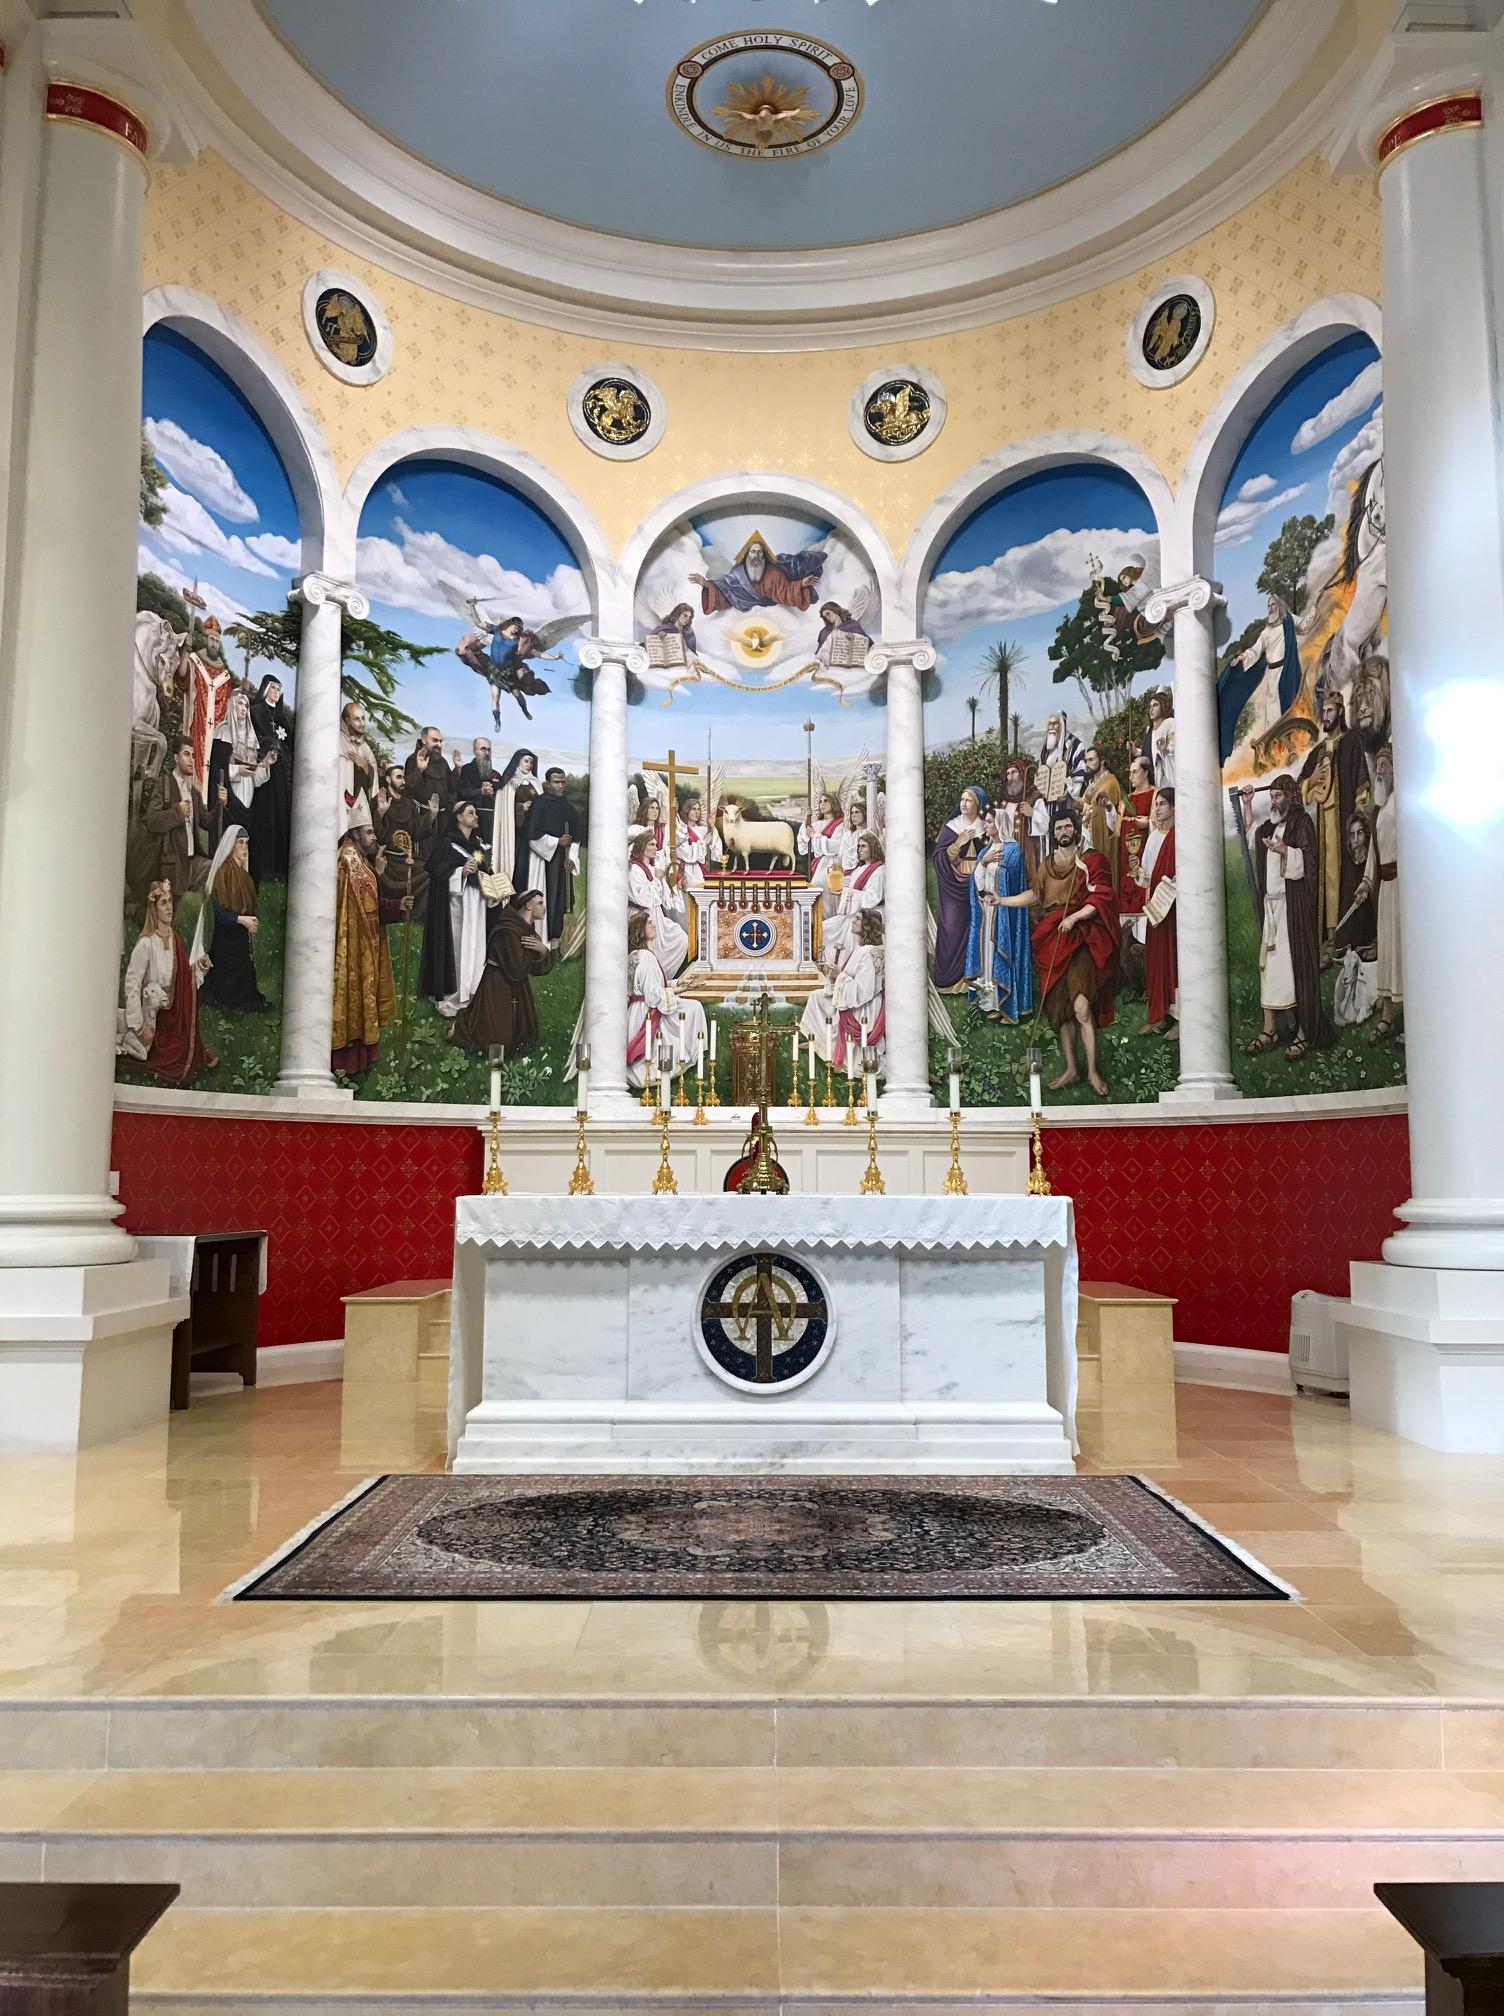 art-and-liturgy-church-madness-2017-st-ann-church-sanctuary-with-murals-charlotte-nc-4.jpg